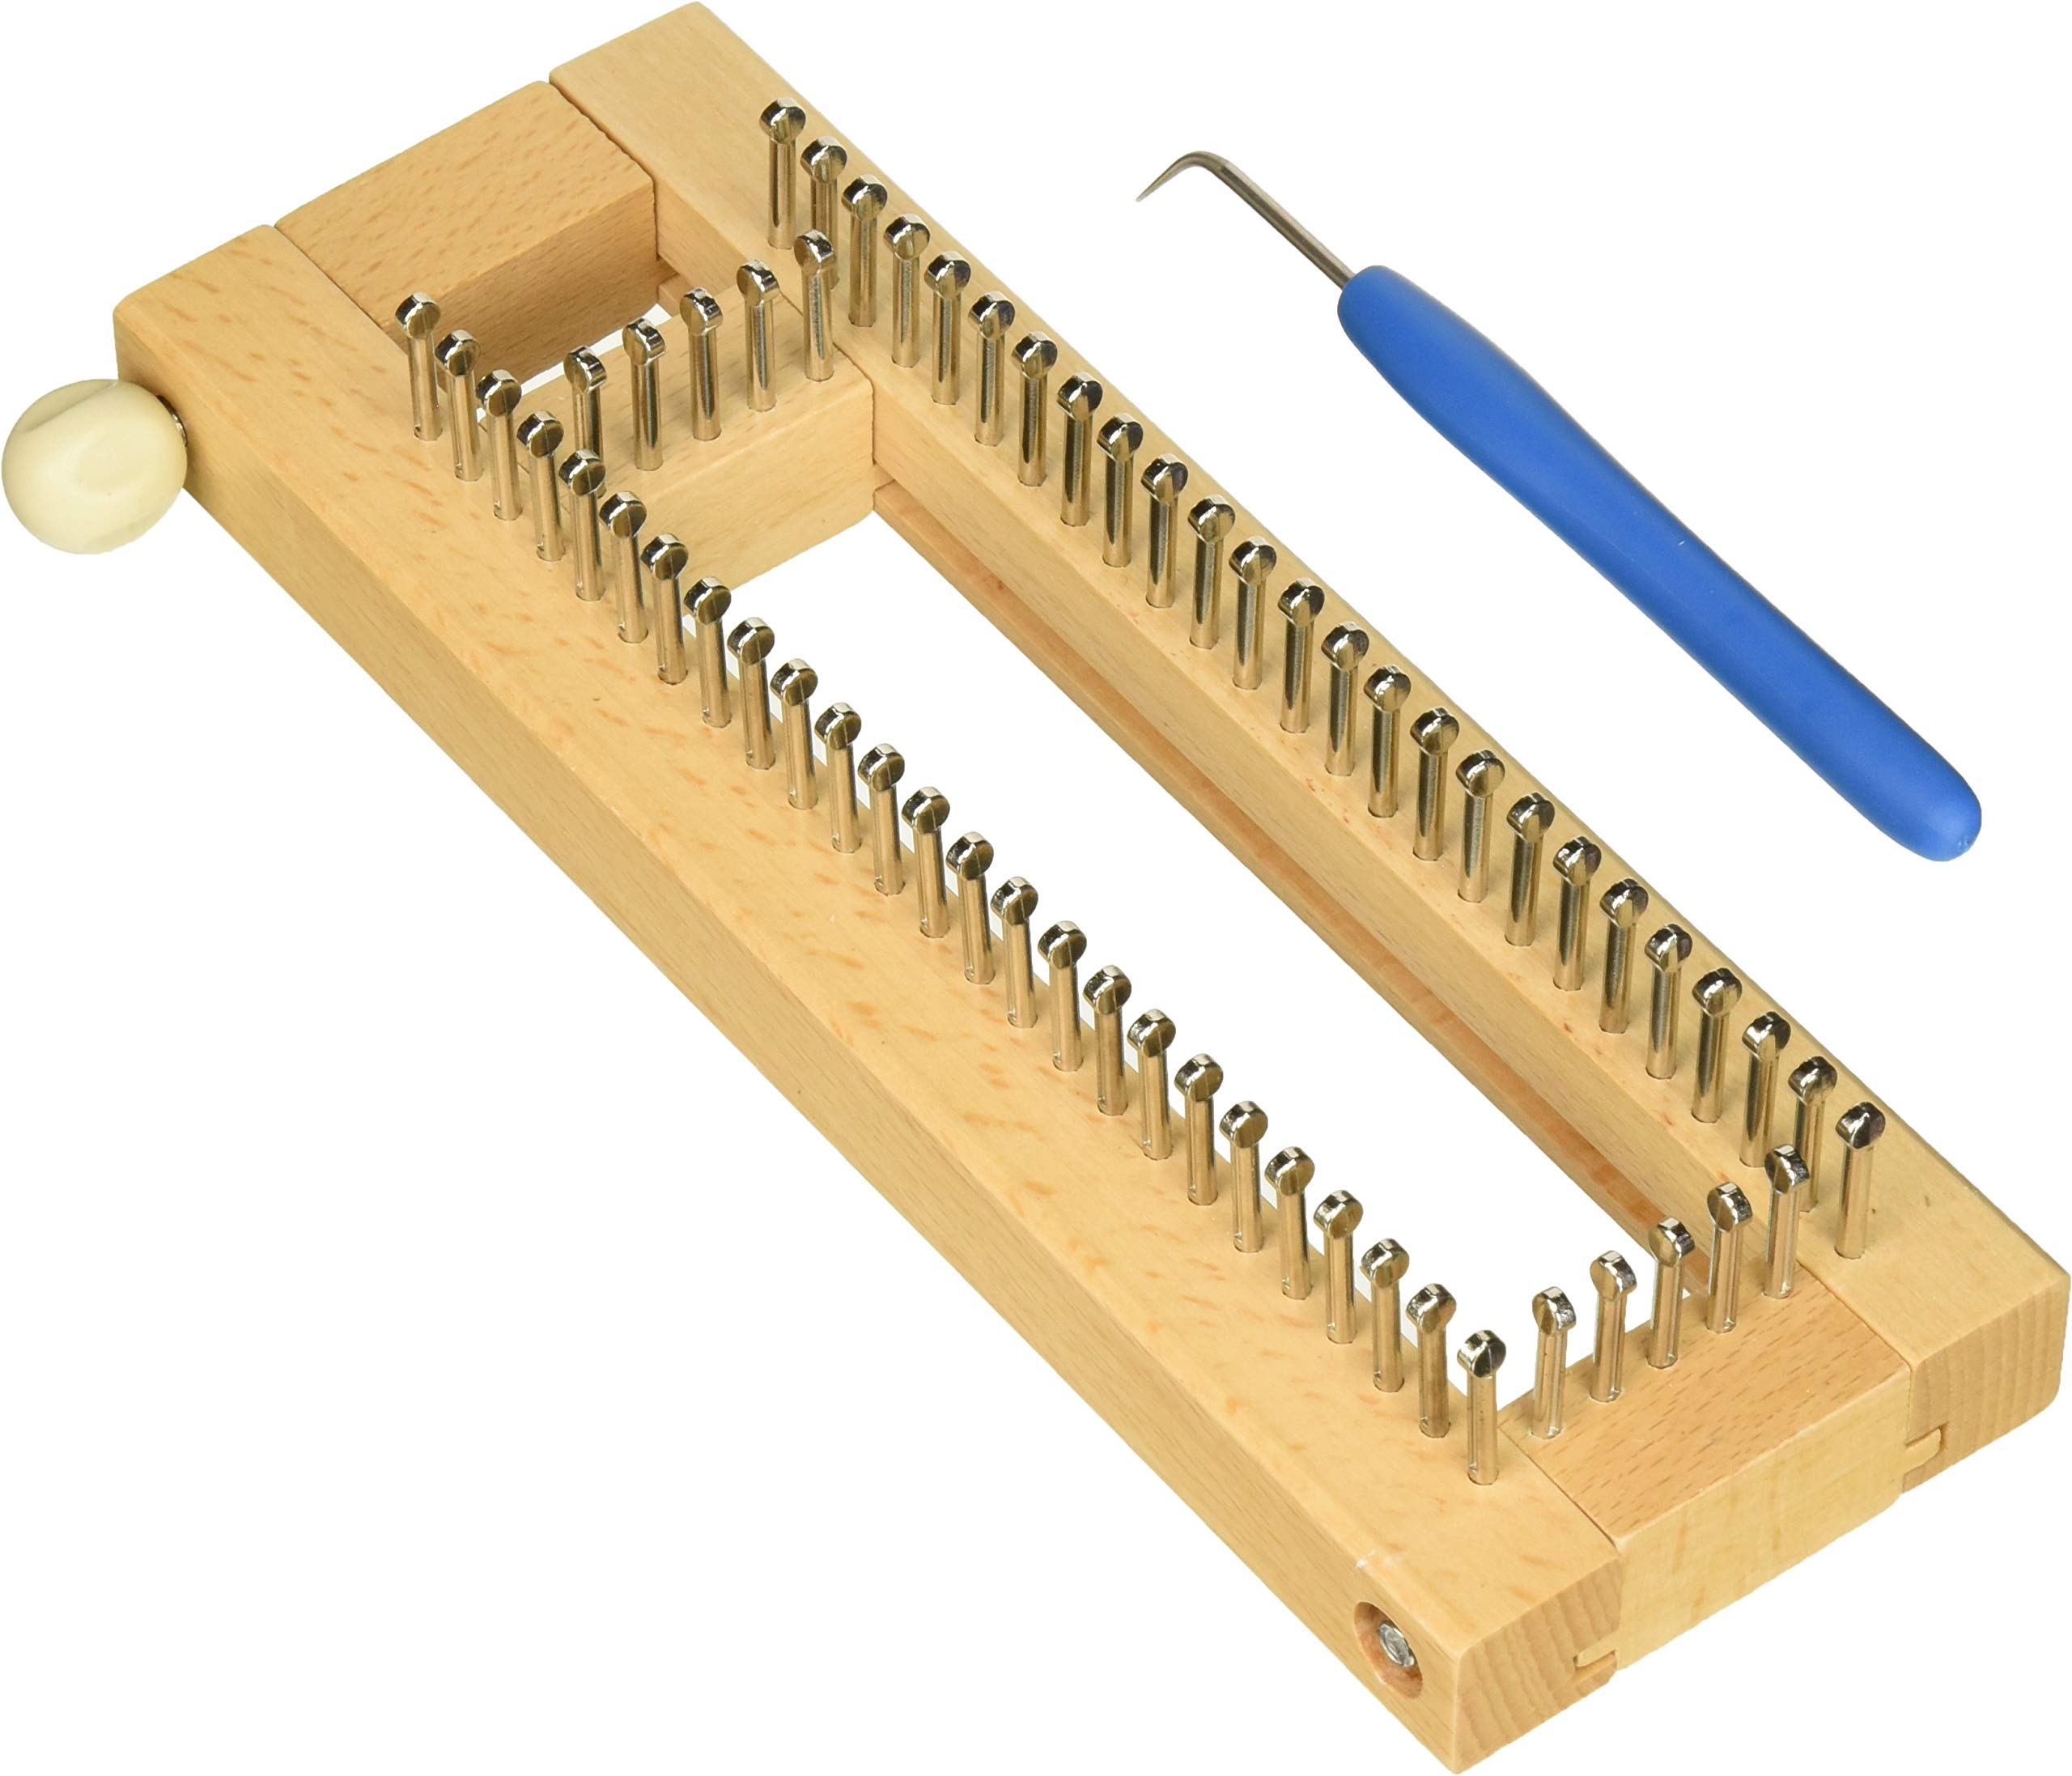 KB Sock Loom Adjustable Wood Knitting Board Kit w/DVD